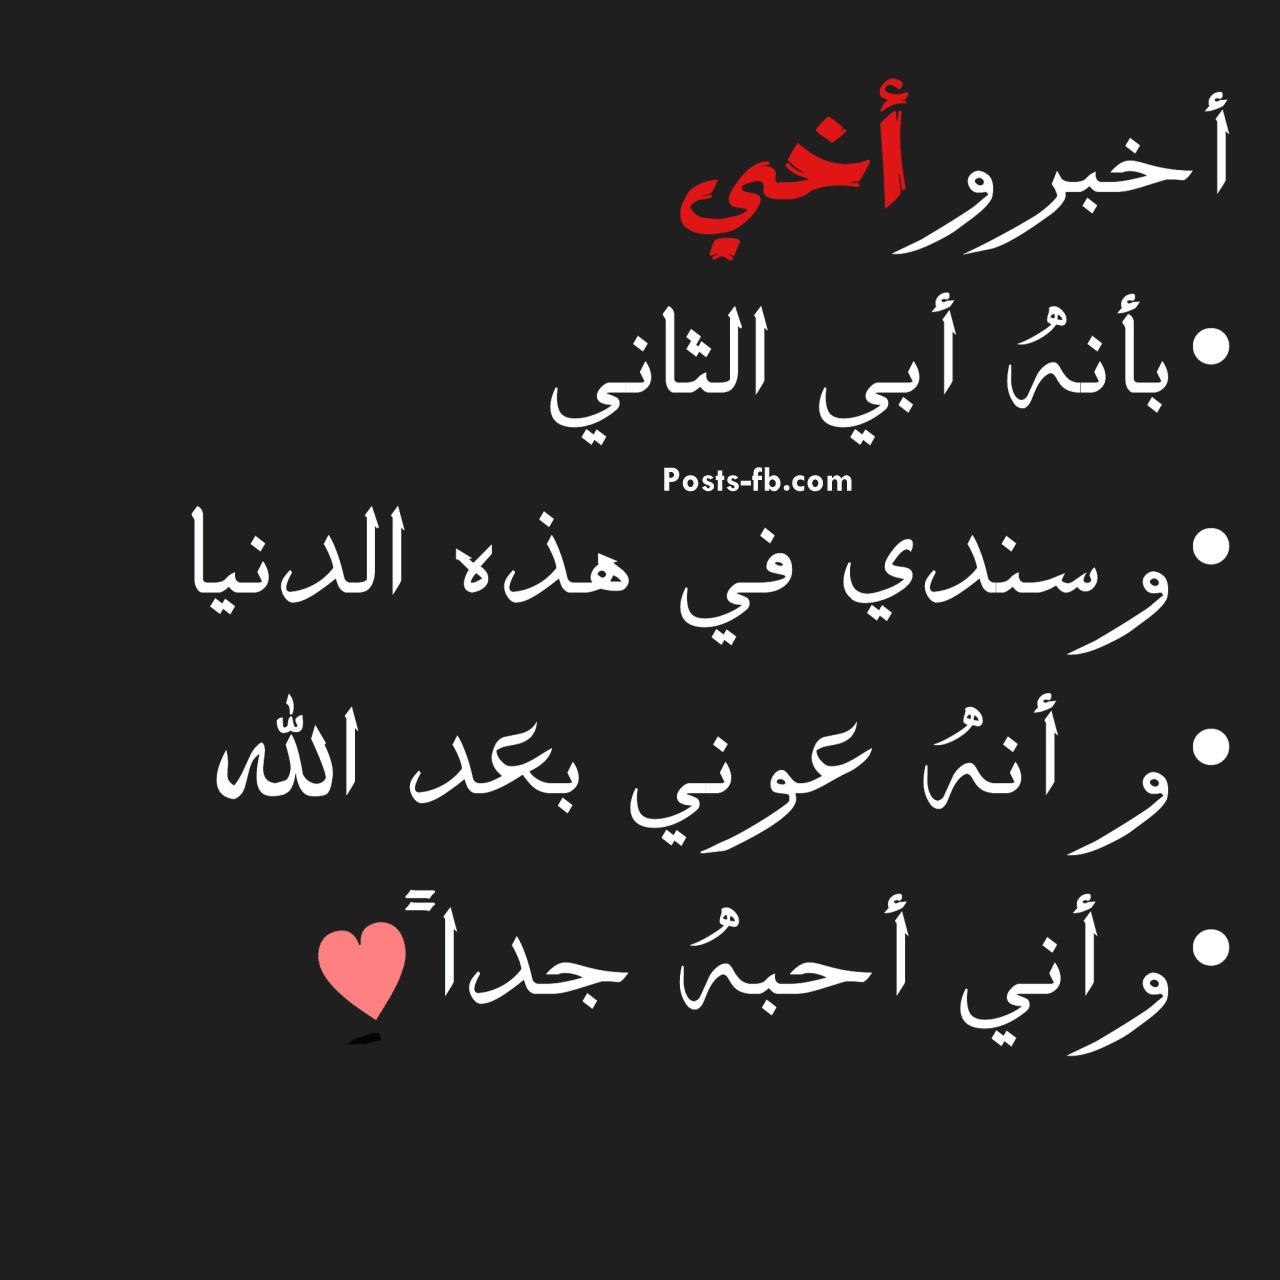 ومضة عن الاخ اخي اخوي ومضات ومضات شعرية Funny Arabic Quotes Inspirational Quotes Wallpapers Beautiful Arabic Words